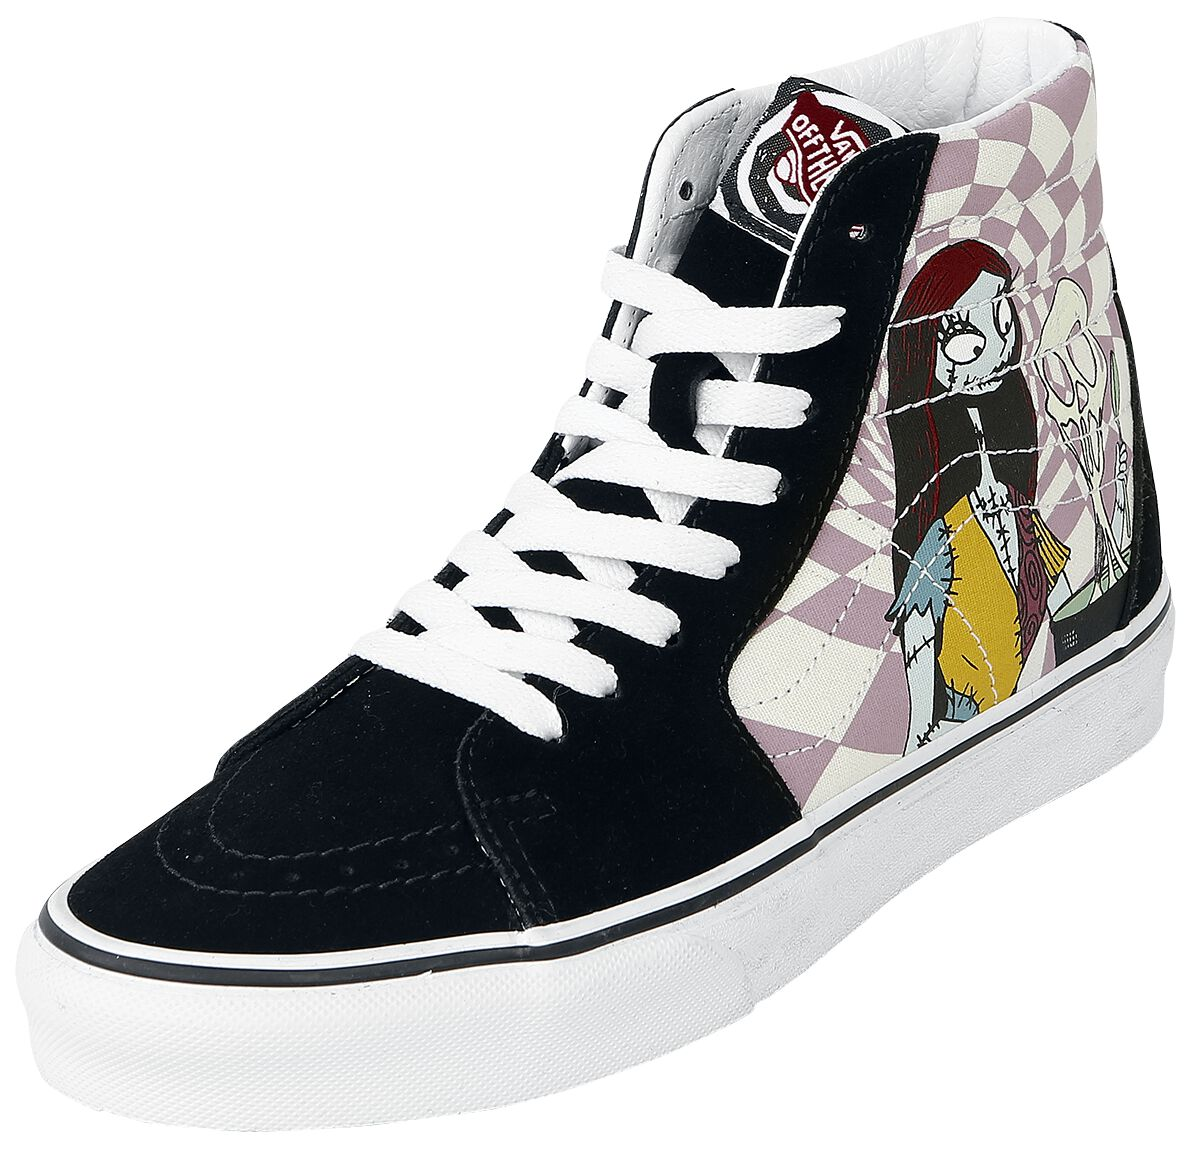 Sneakers für Frauen - Vans SK8 Hi Sally (Disney) Nightmare Before Christmas Sneaker high schwarz pink  - Onlineshop EMP